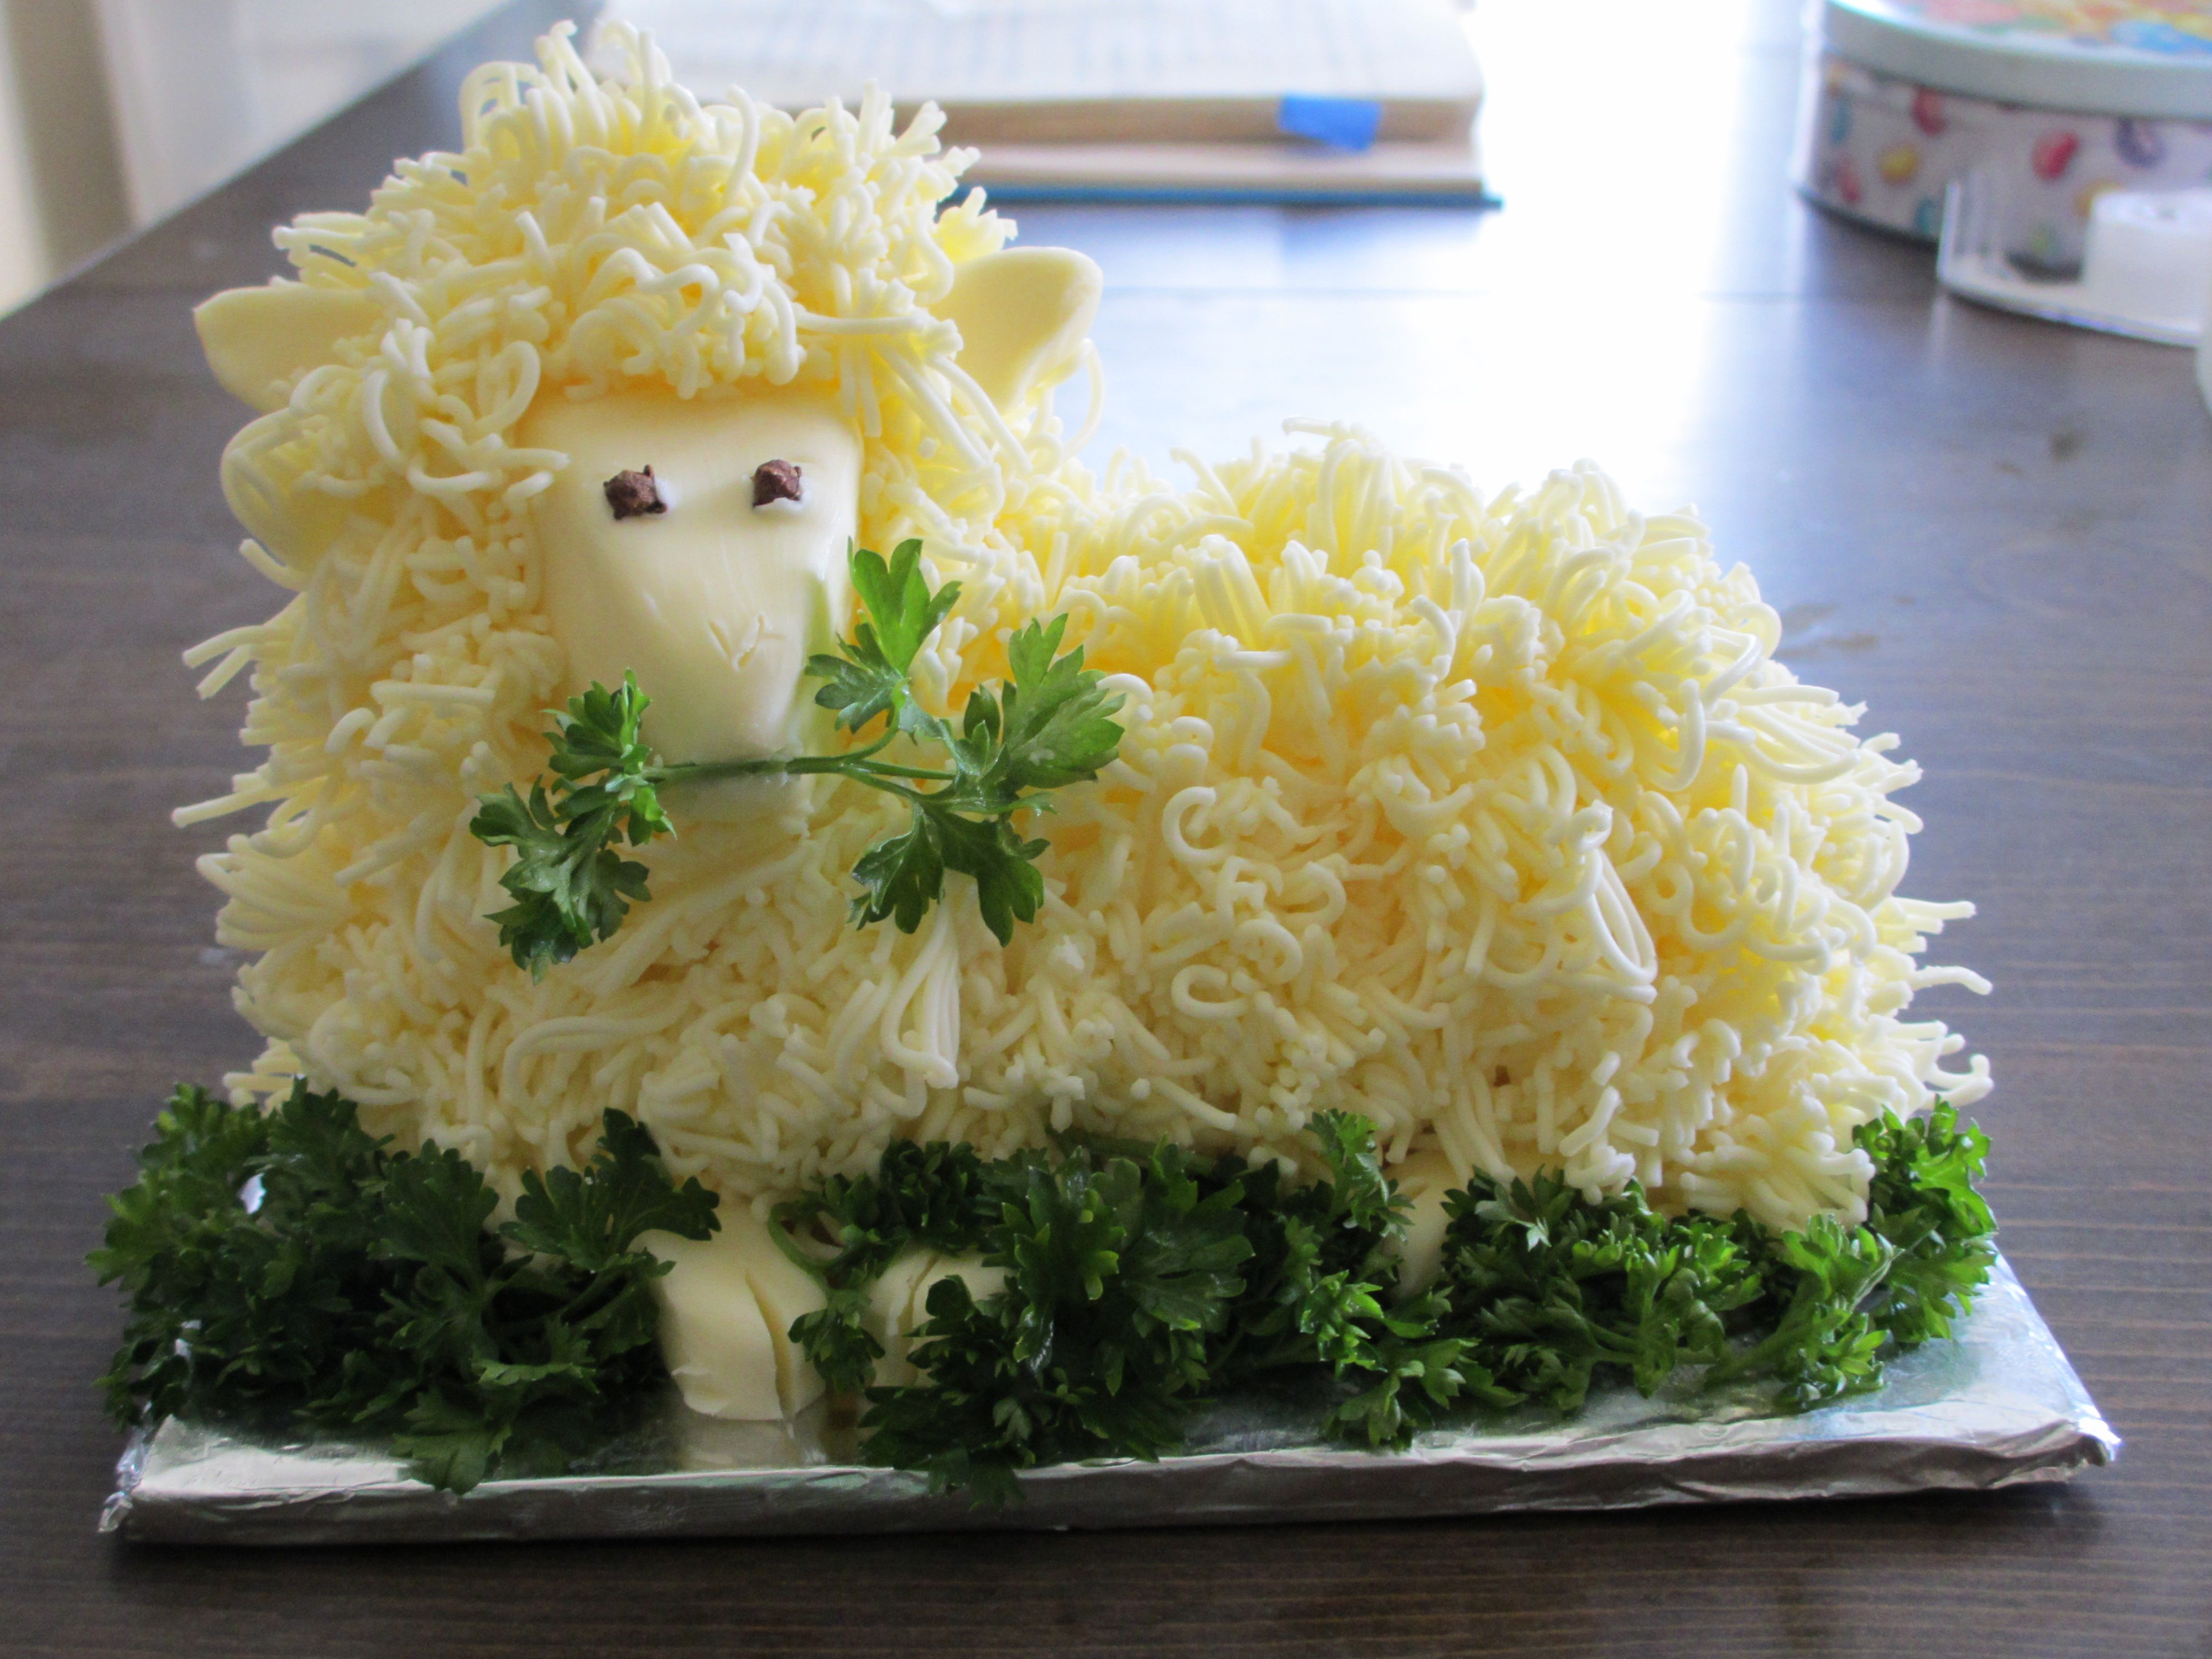 Hasil gambar untuk butter lamb